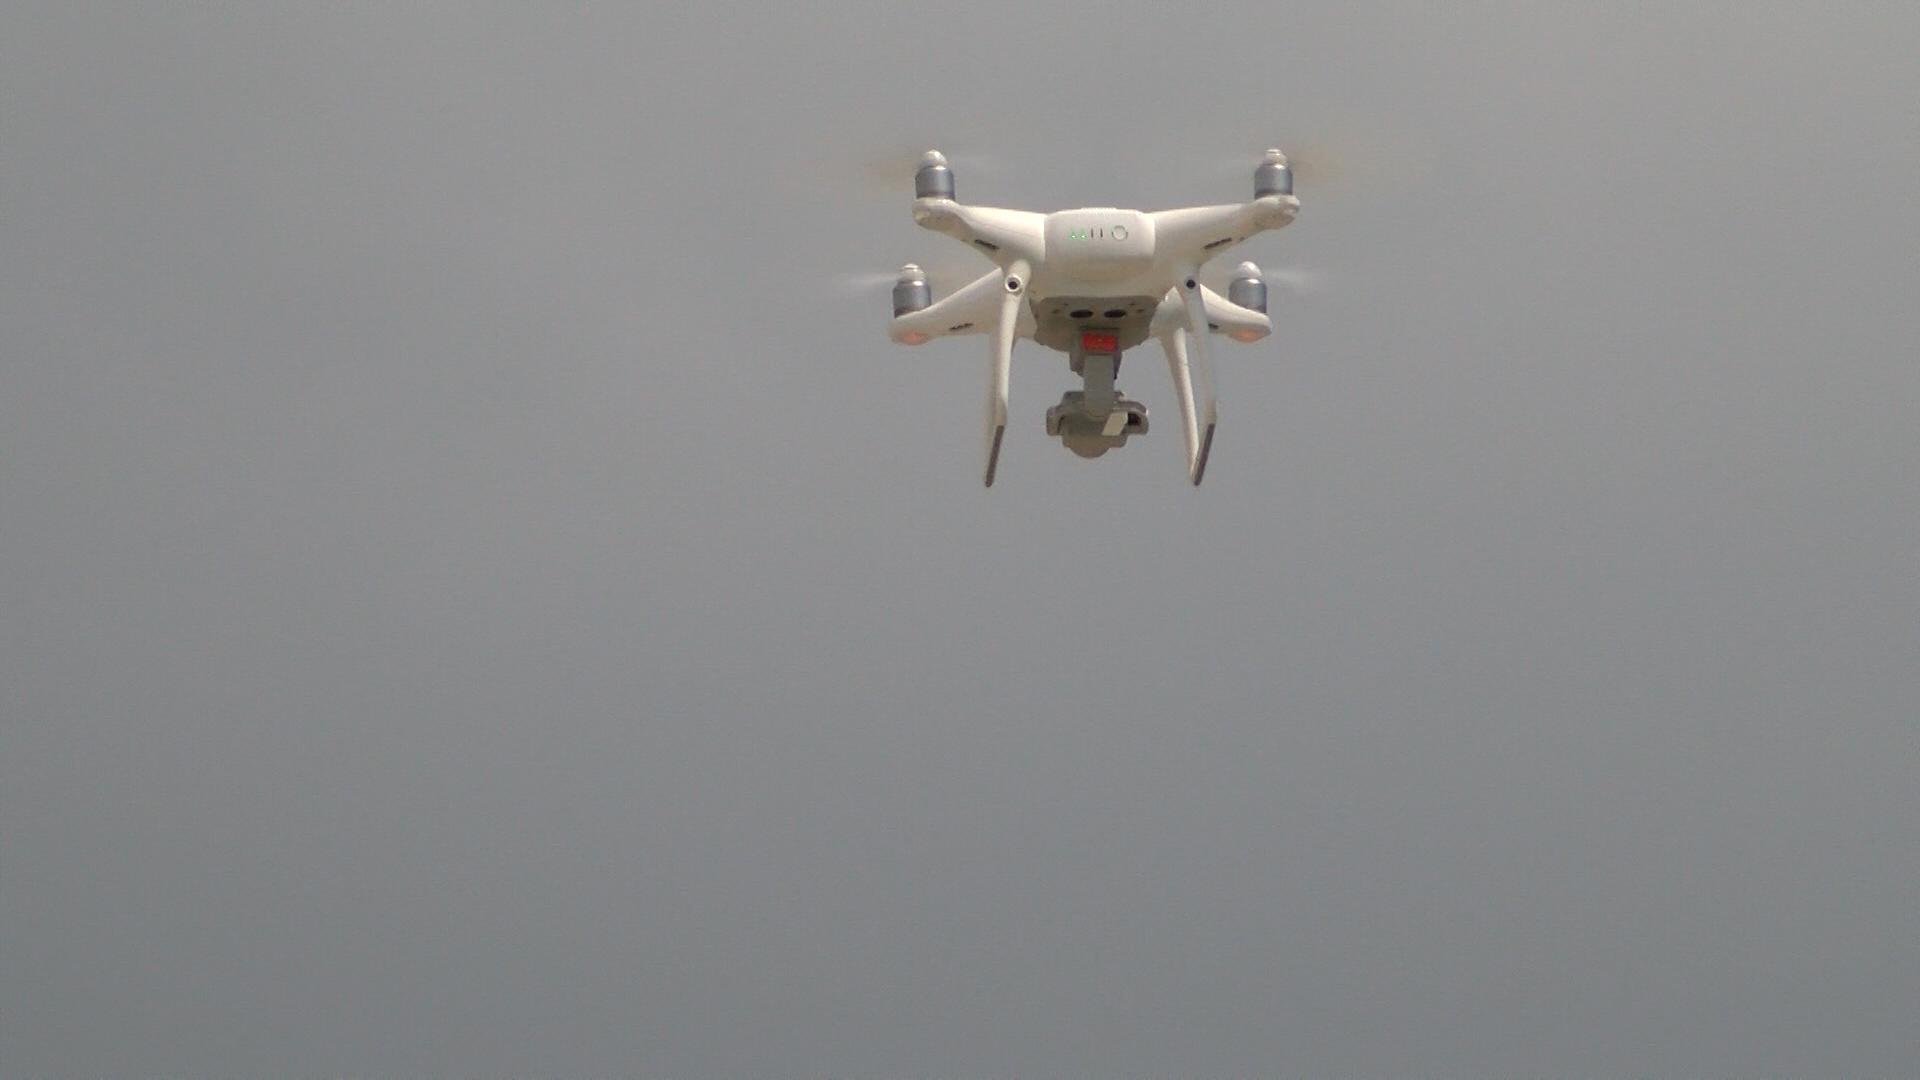 Ameren Drone_1501624742860.jpg